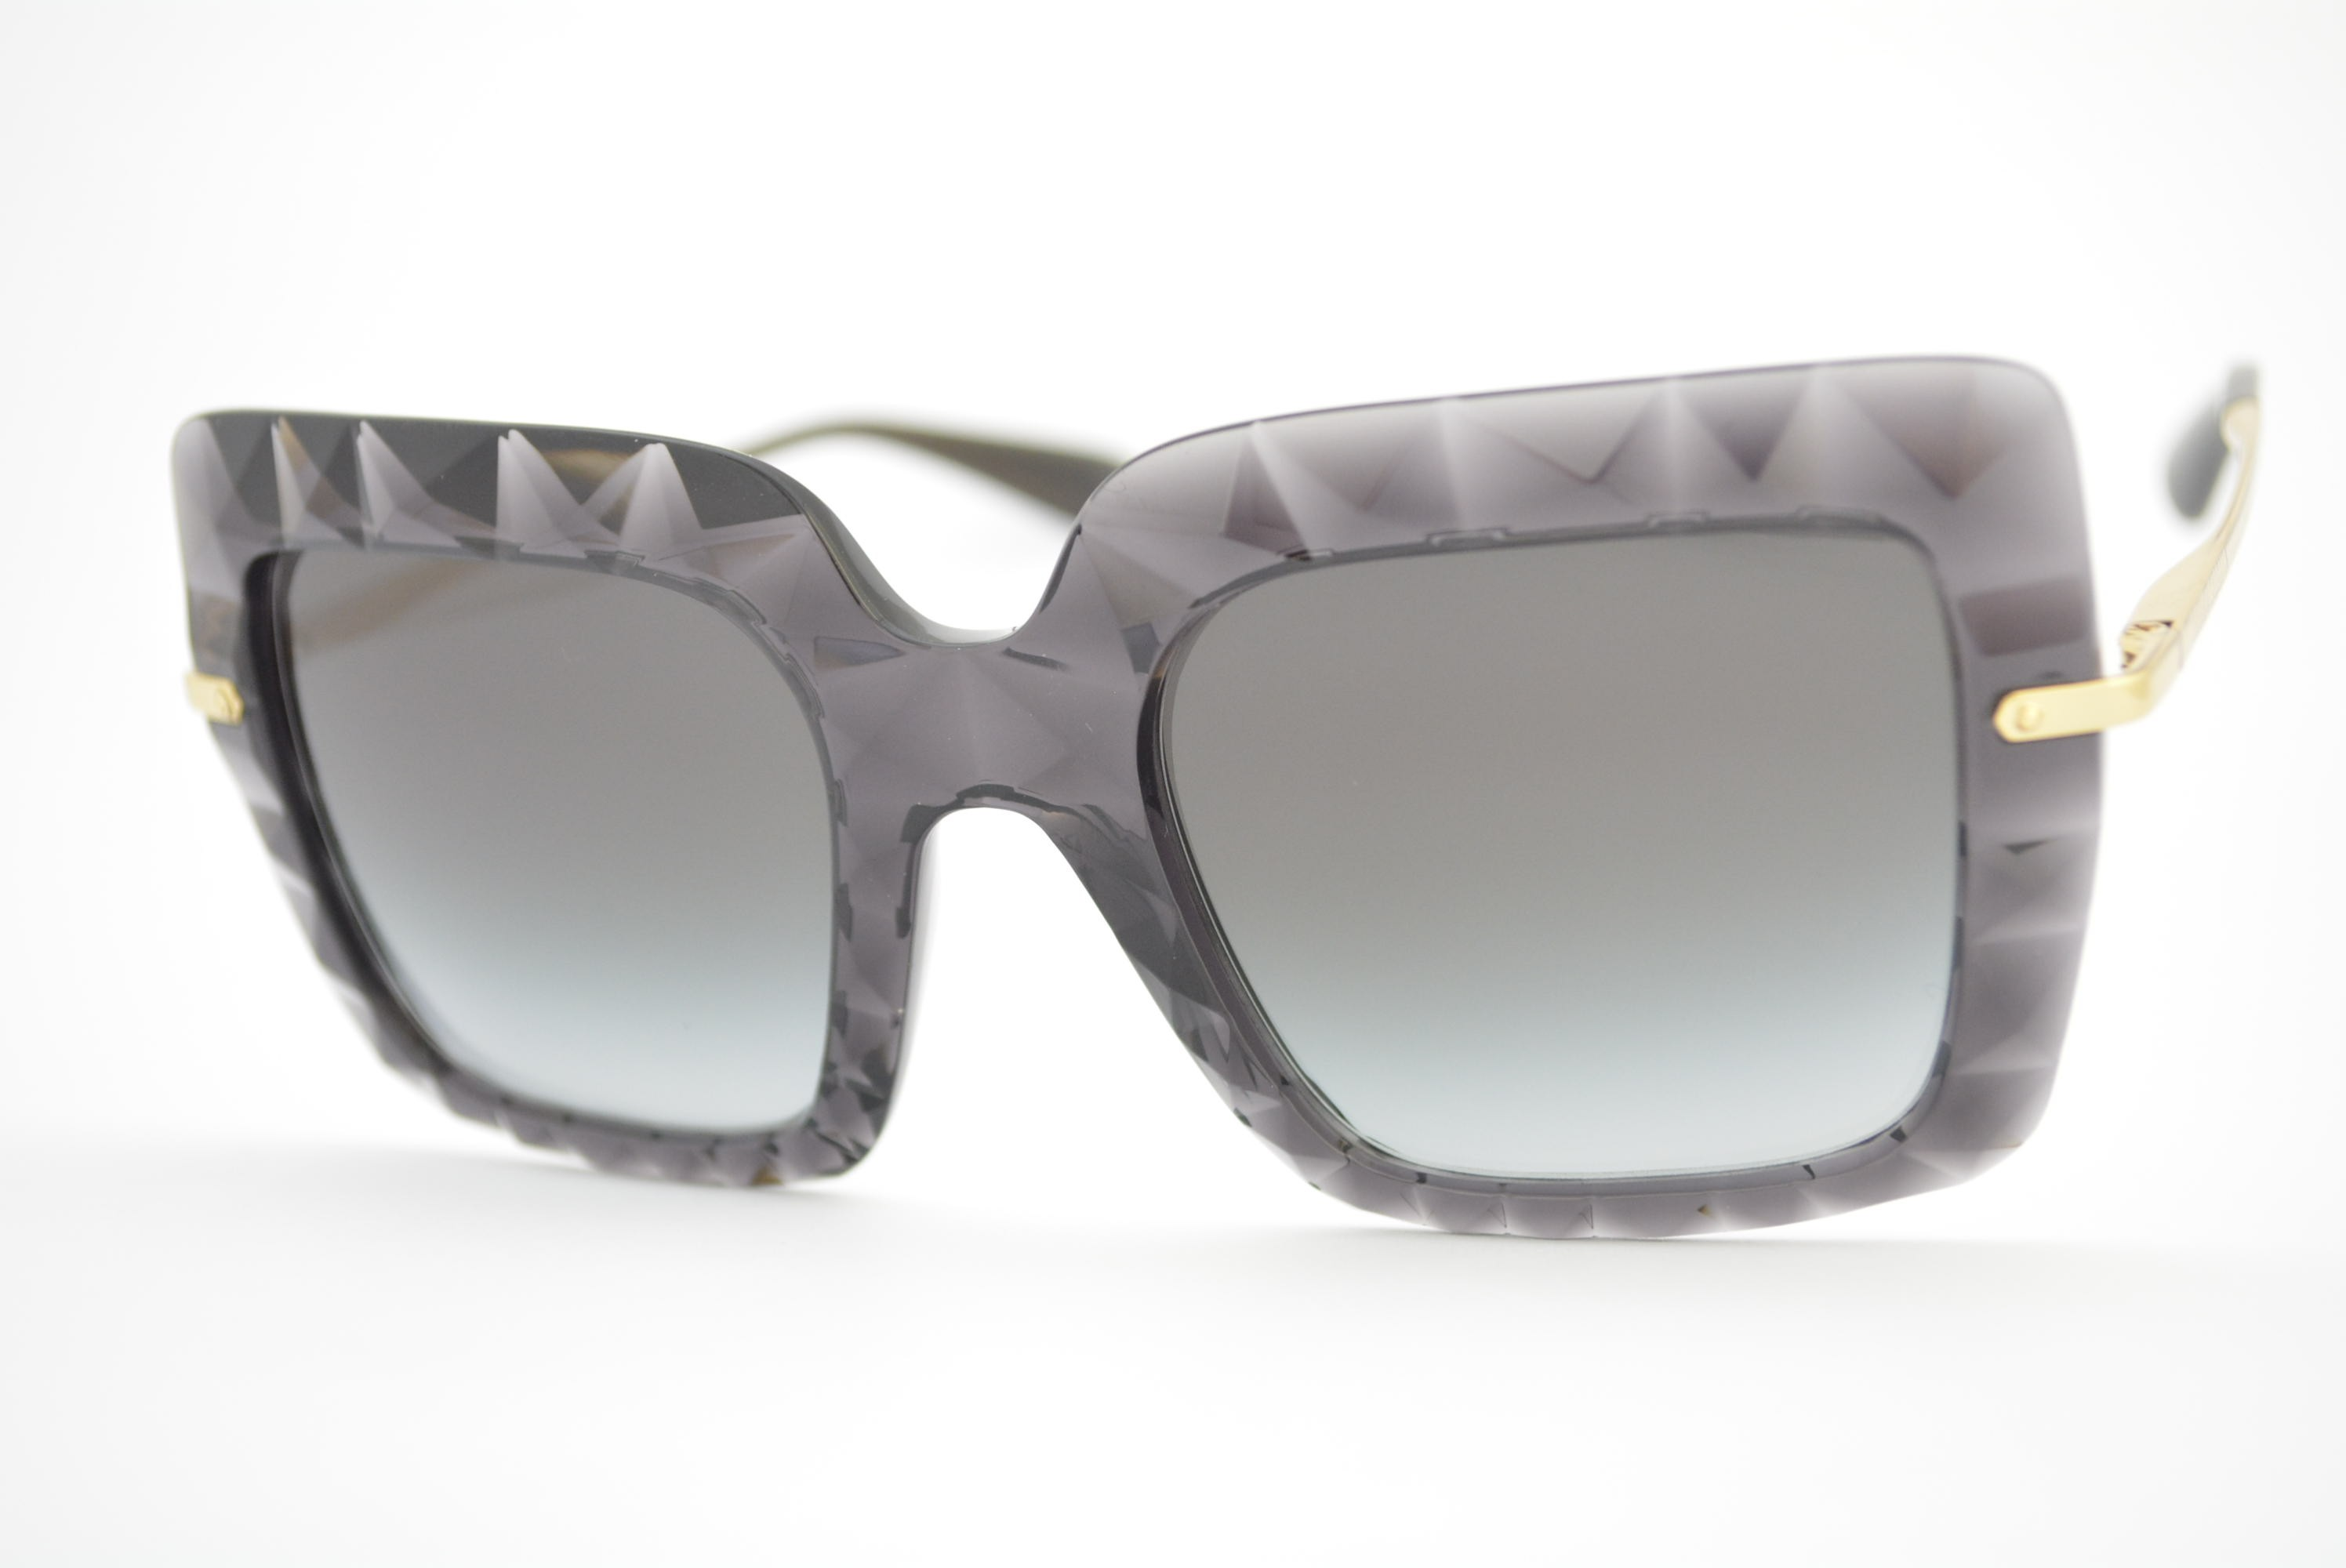 óculos de sol Dolce & Gabbana mod DG6111 504/8g